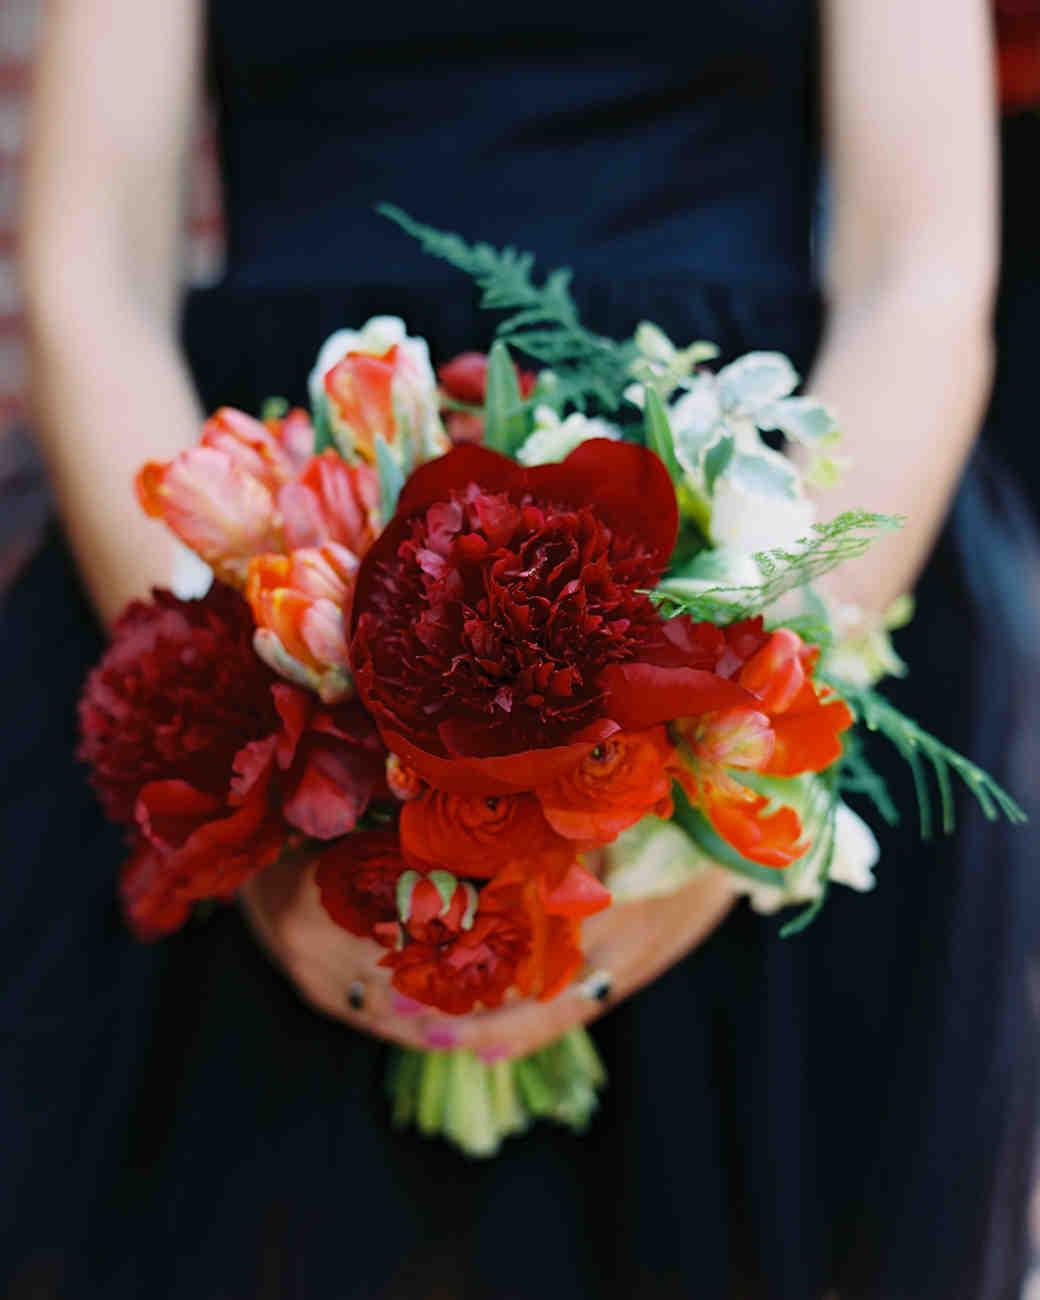 shannon-ryan-wedding-bouquet-301-s111853-0415.jpg